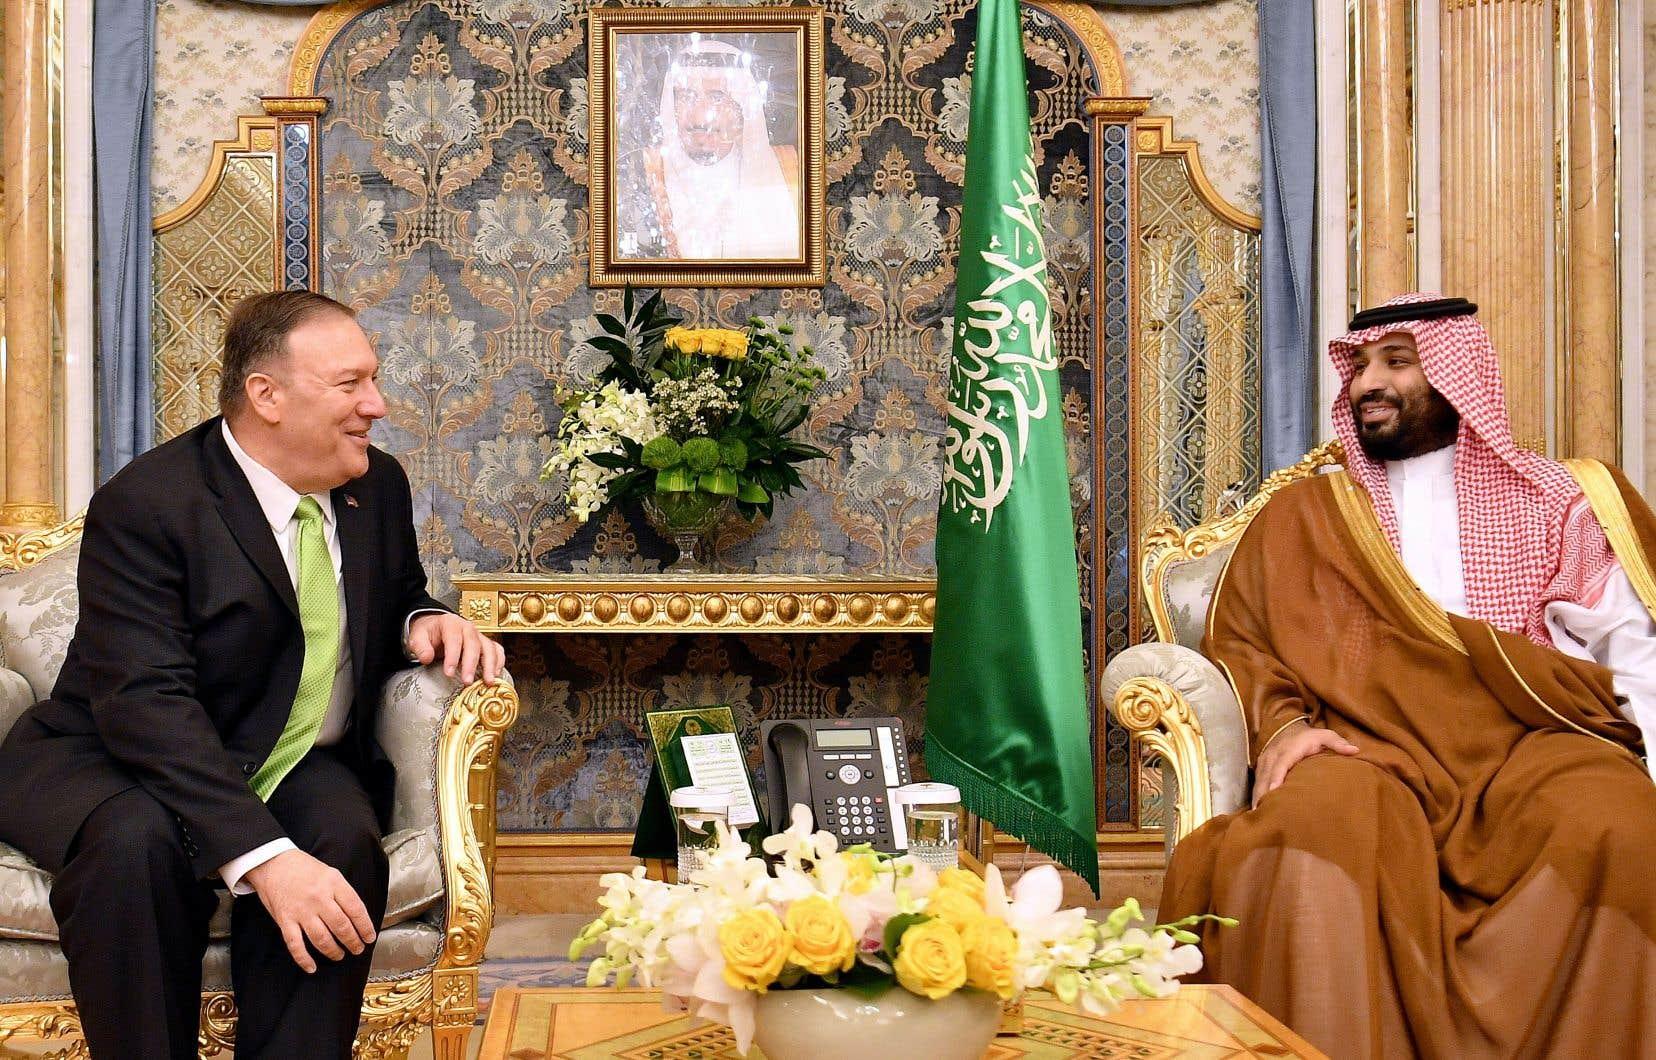 site de rencontre arabie saoudite gratuit)